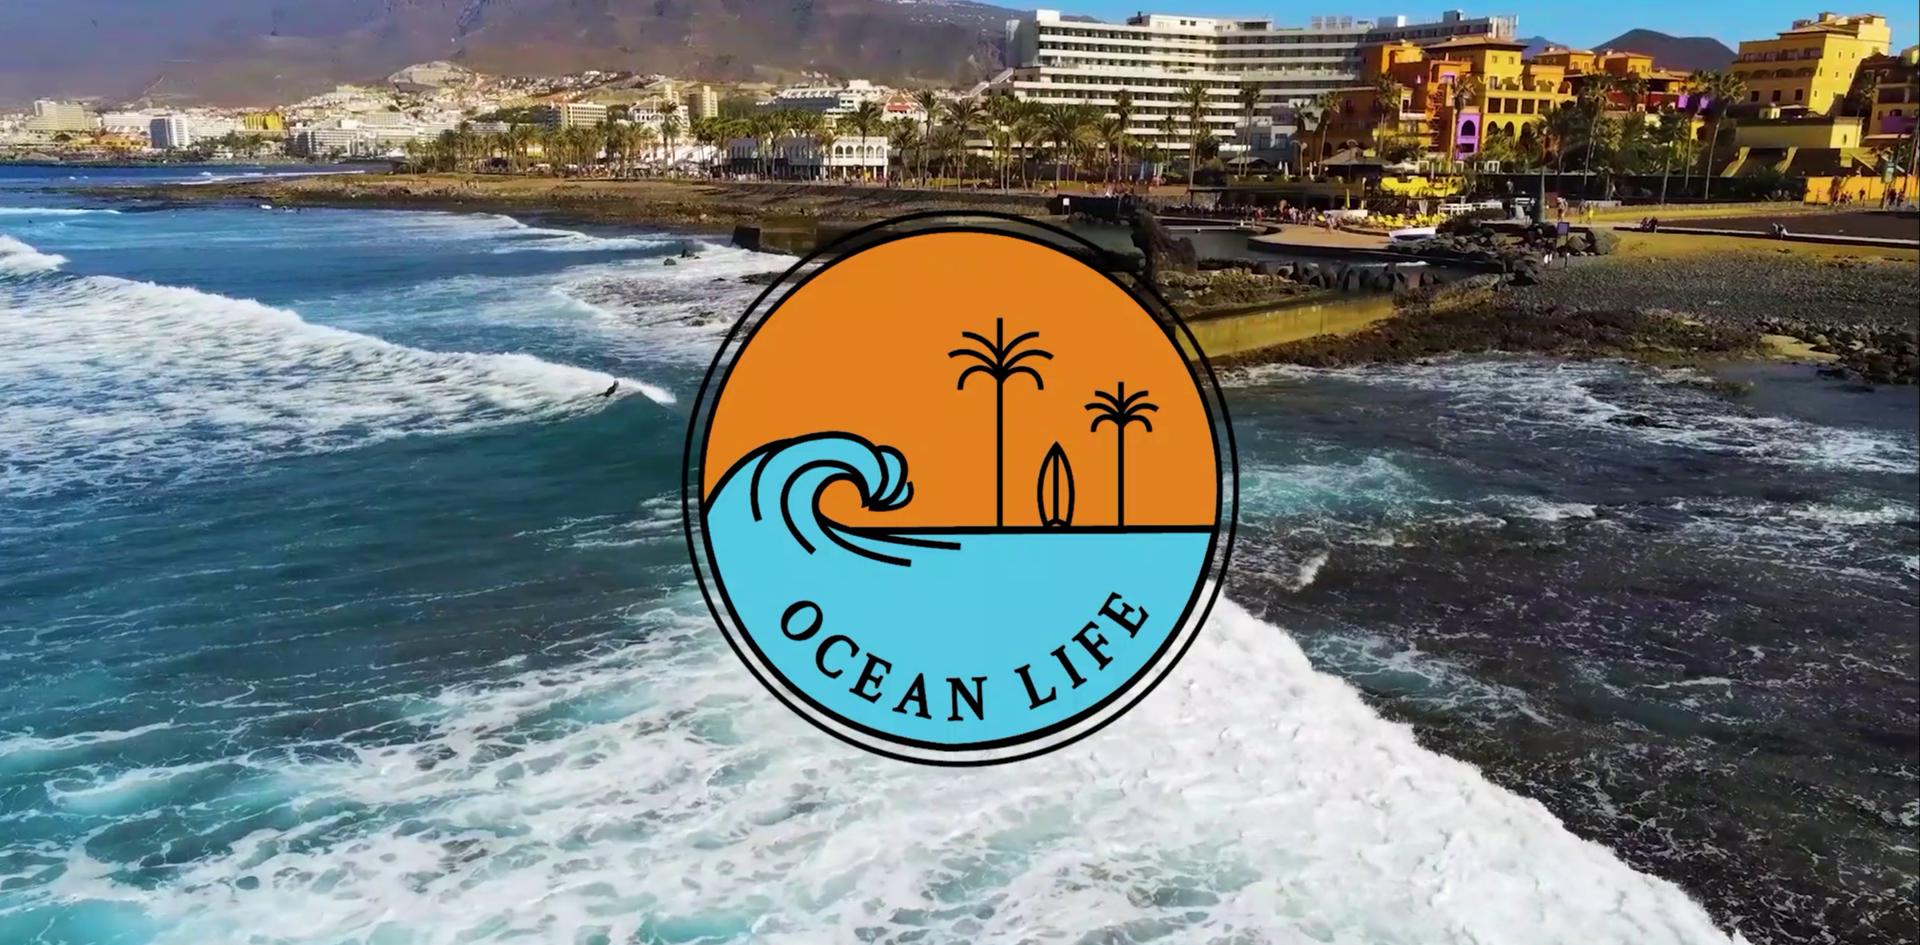 Ocean Life Surf School - Surfboard Raffle Promotional Video